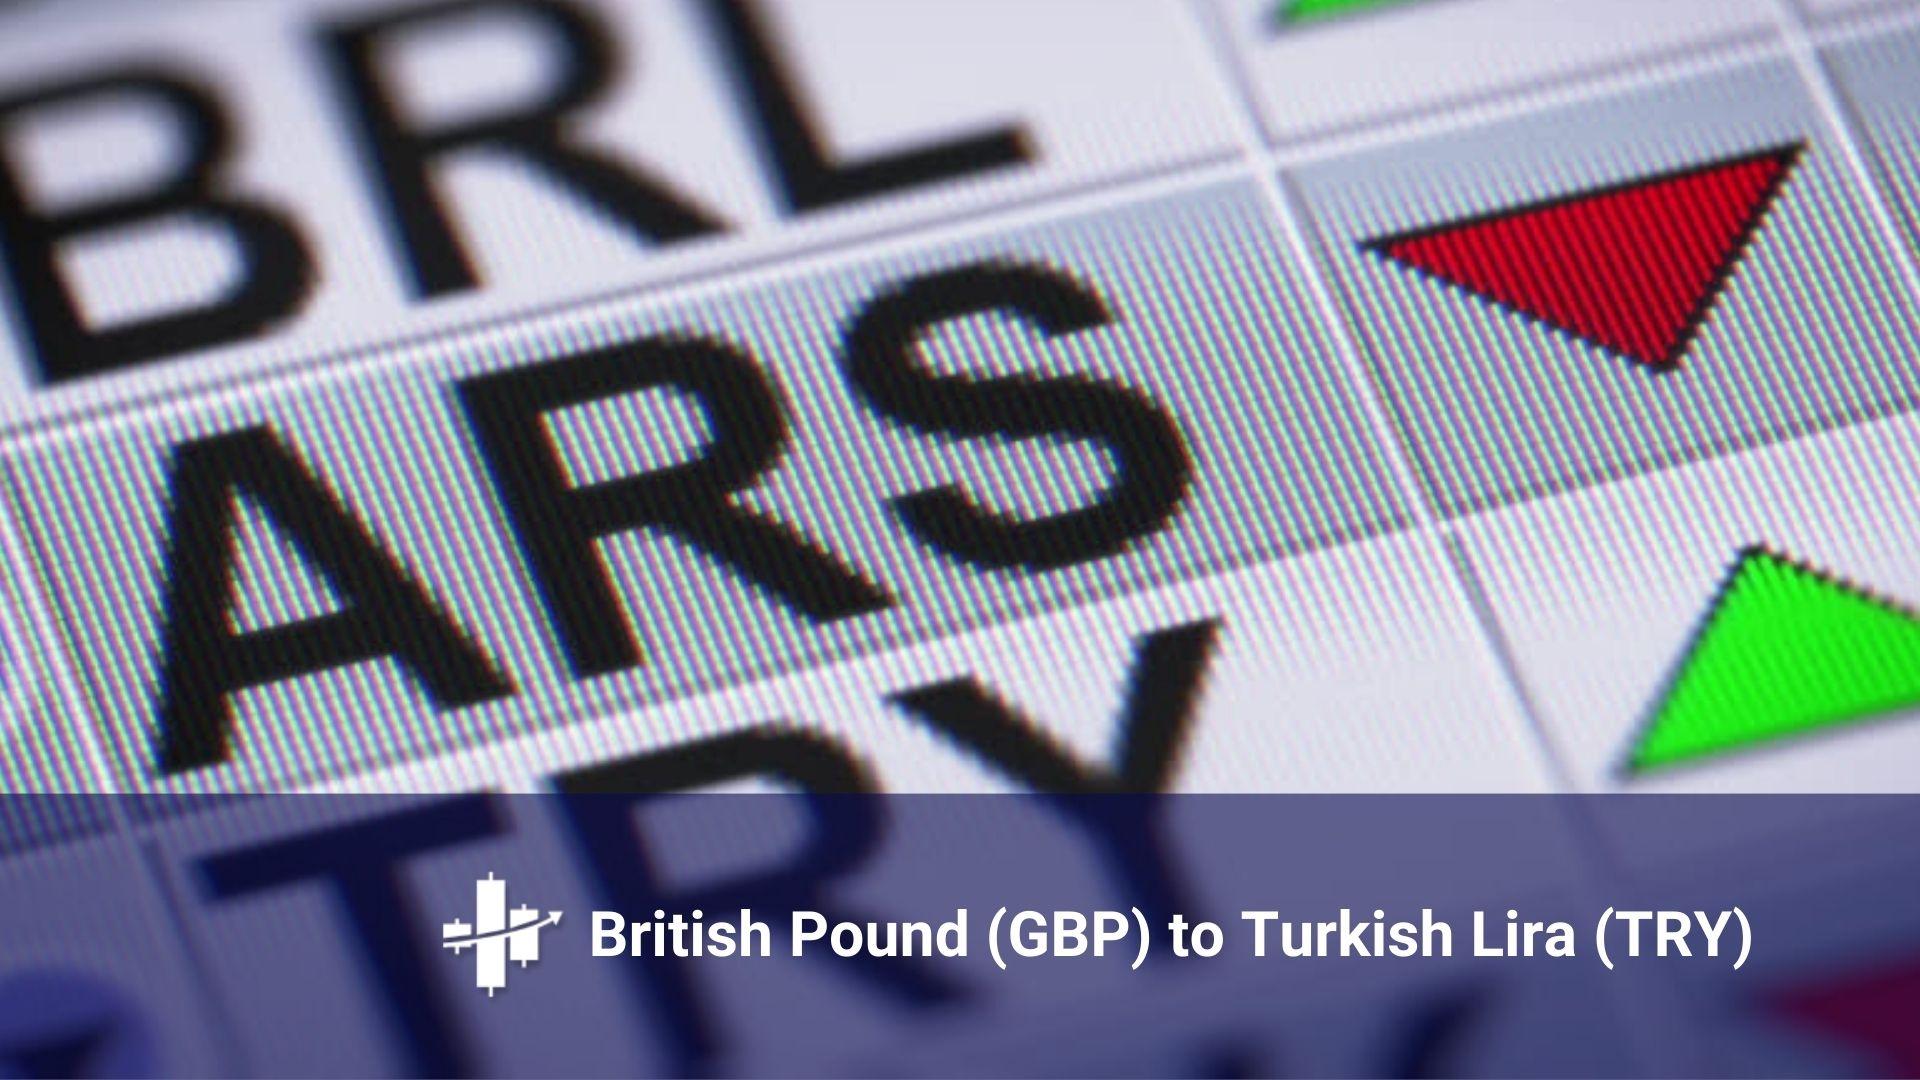 (GBP) To Turkish Lira (TRY)